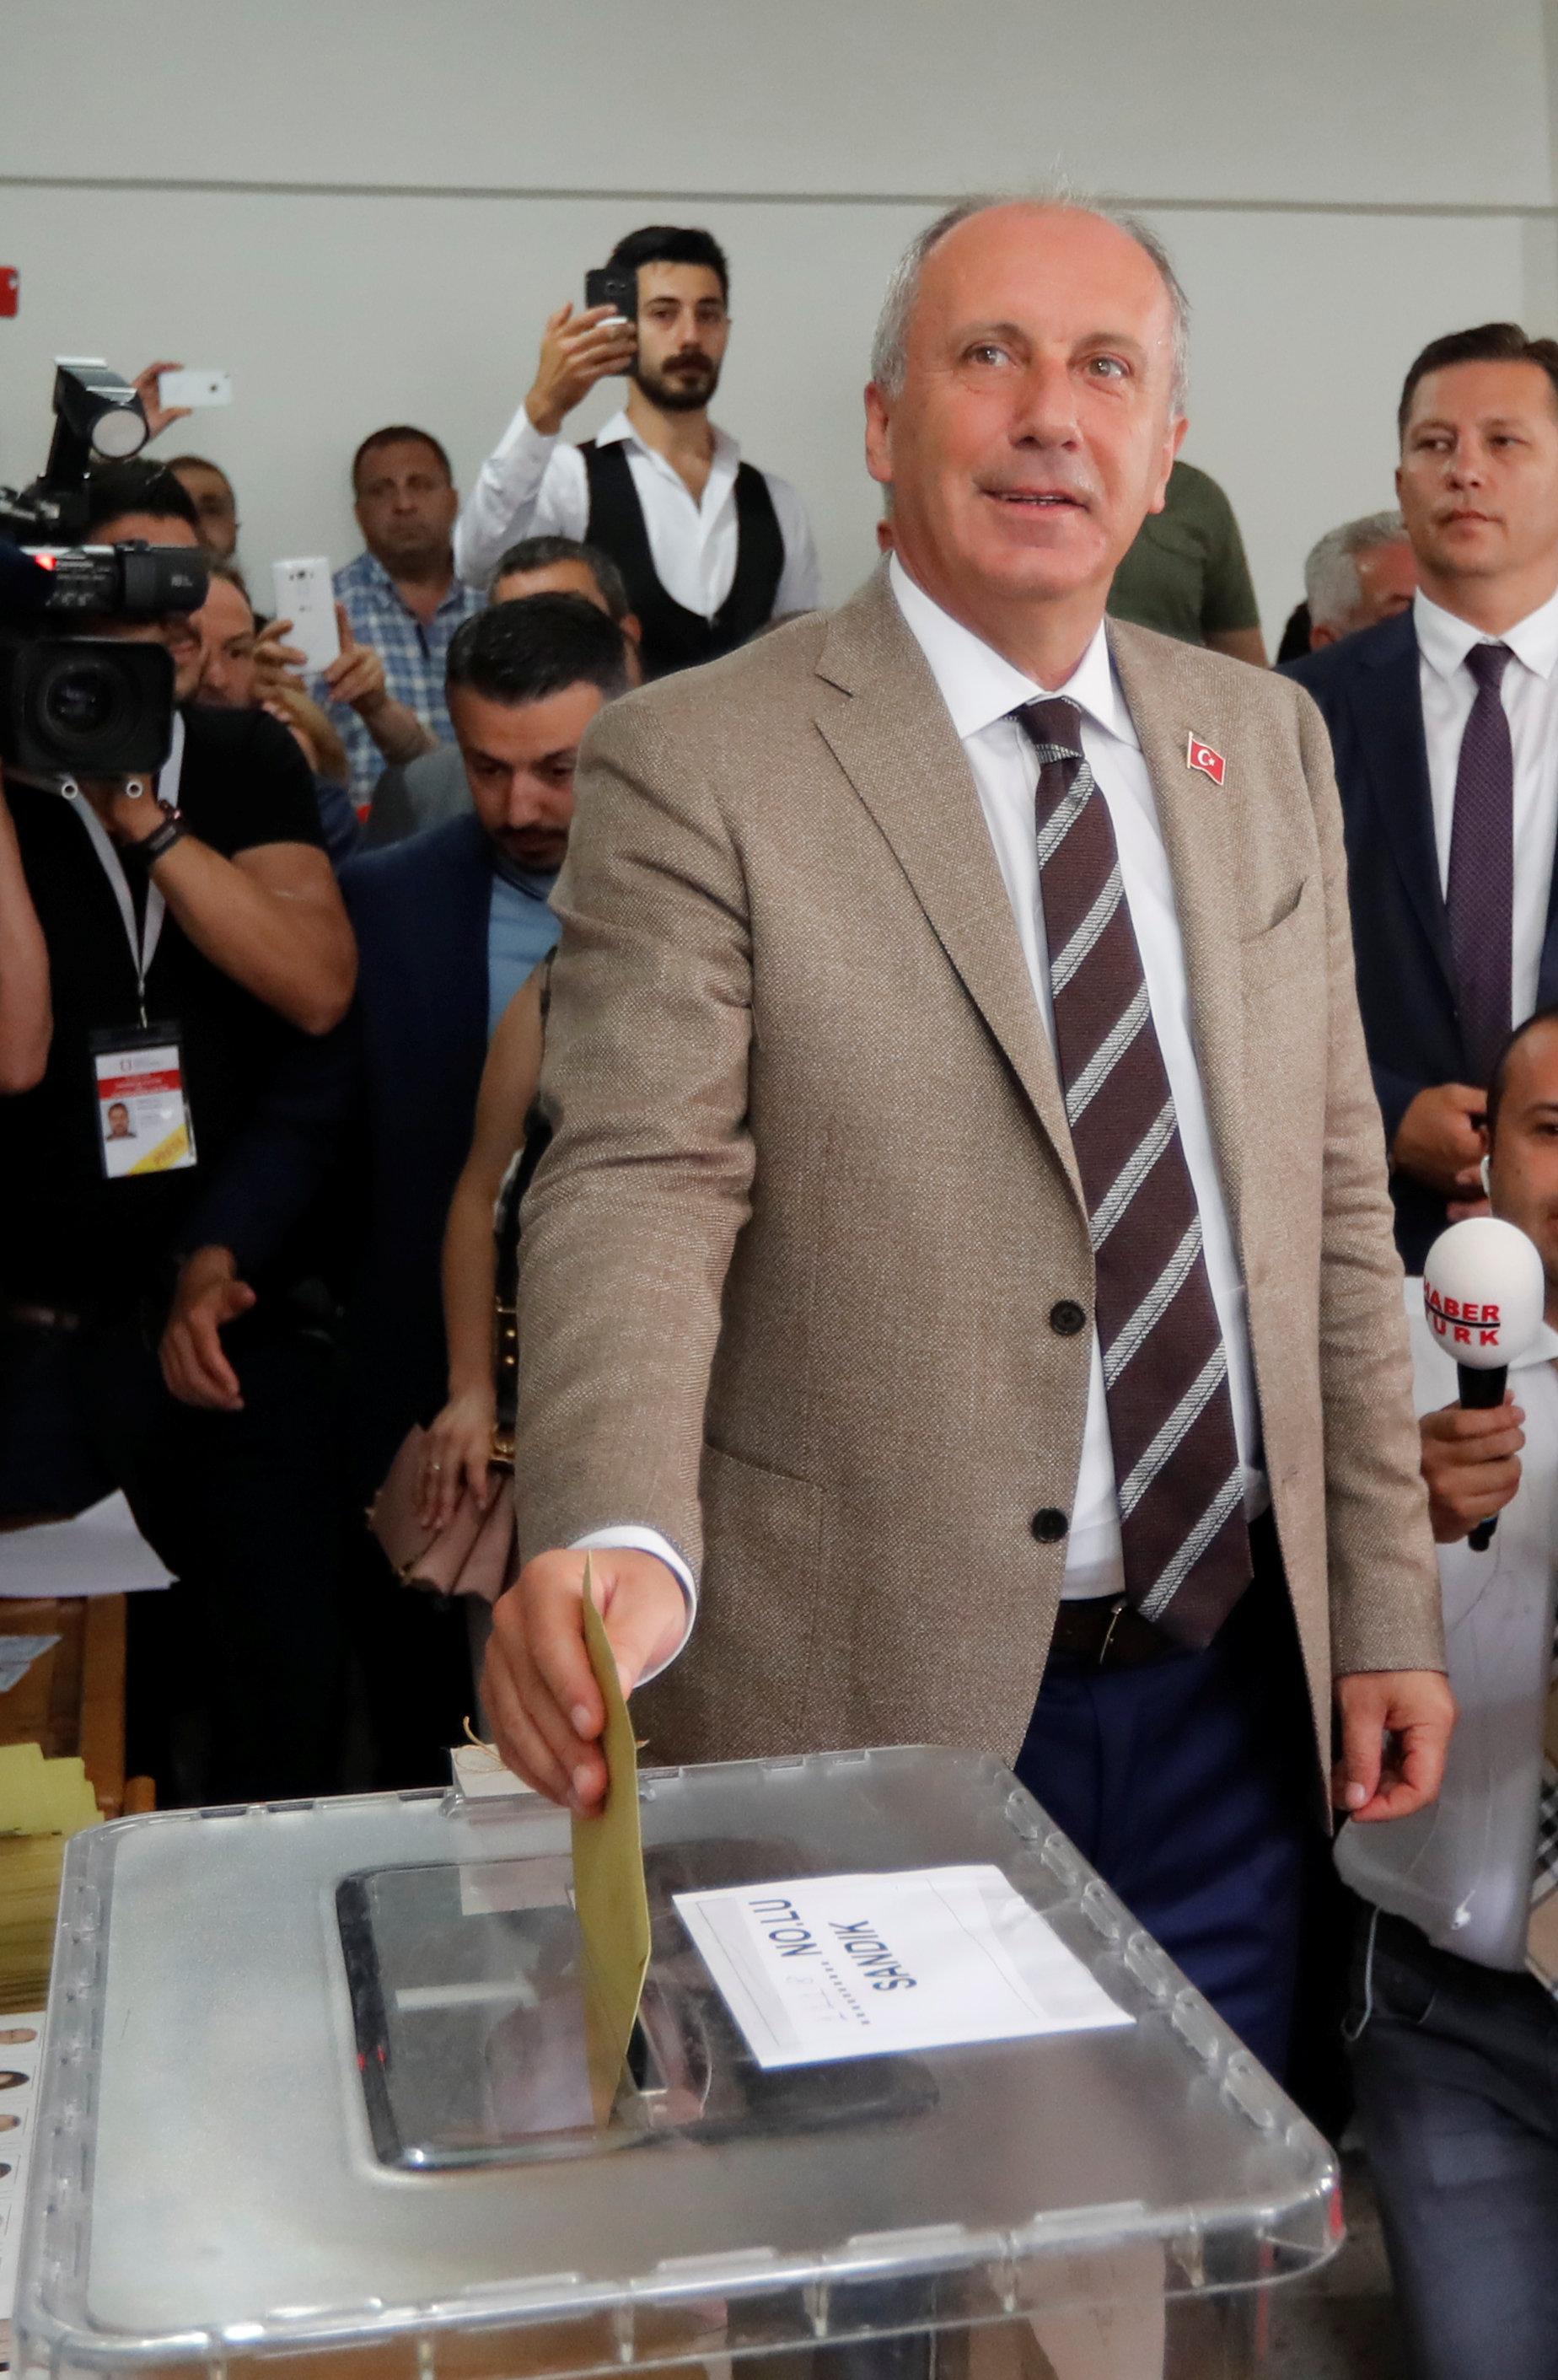 2018-06-24T074116Z_406650832_RC1726ED73A0_RTRMADP_3_TURKEY-ELECTION